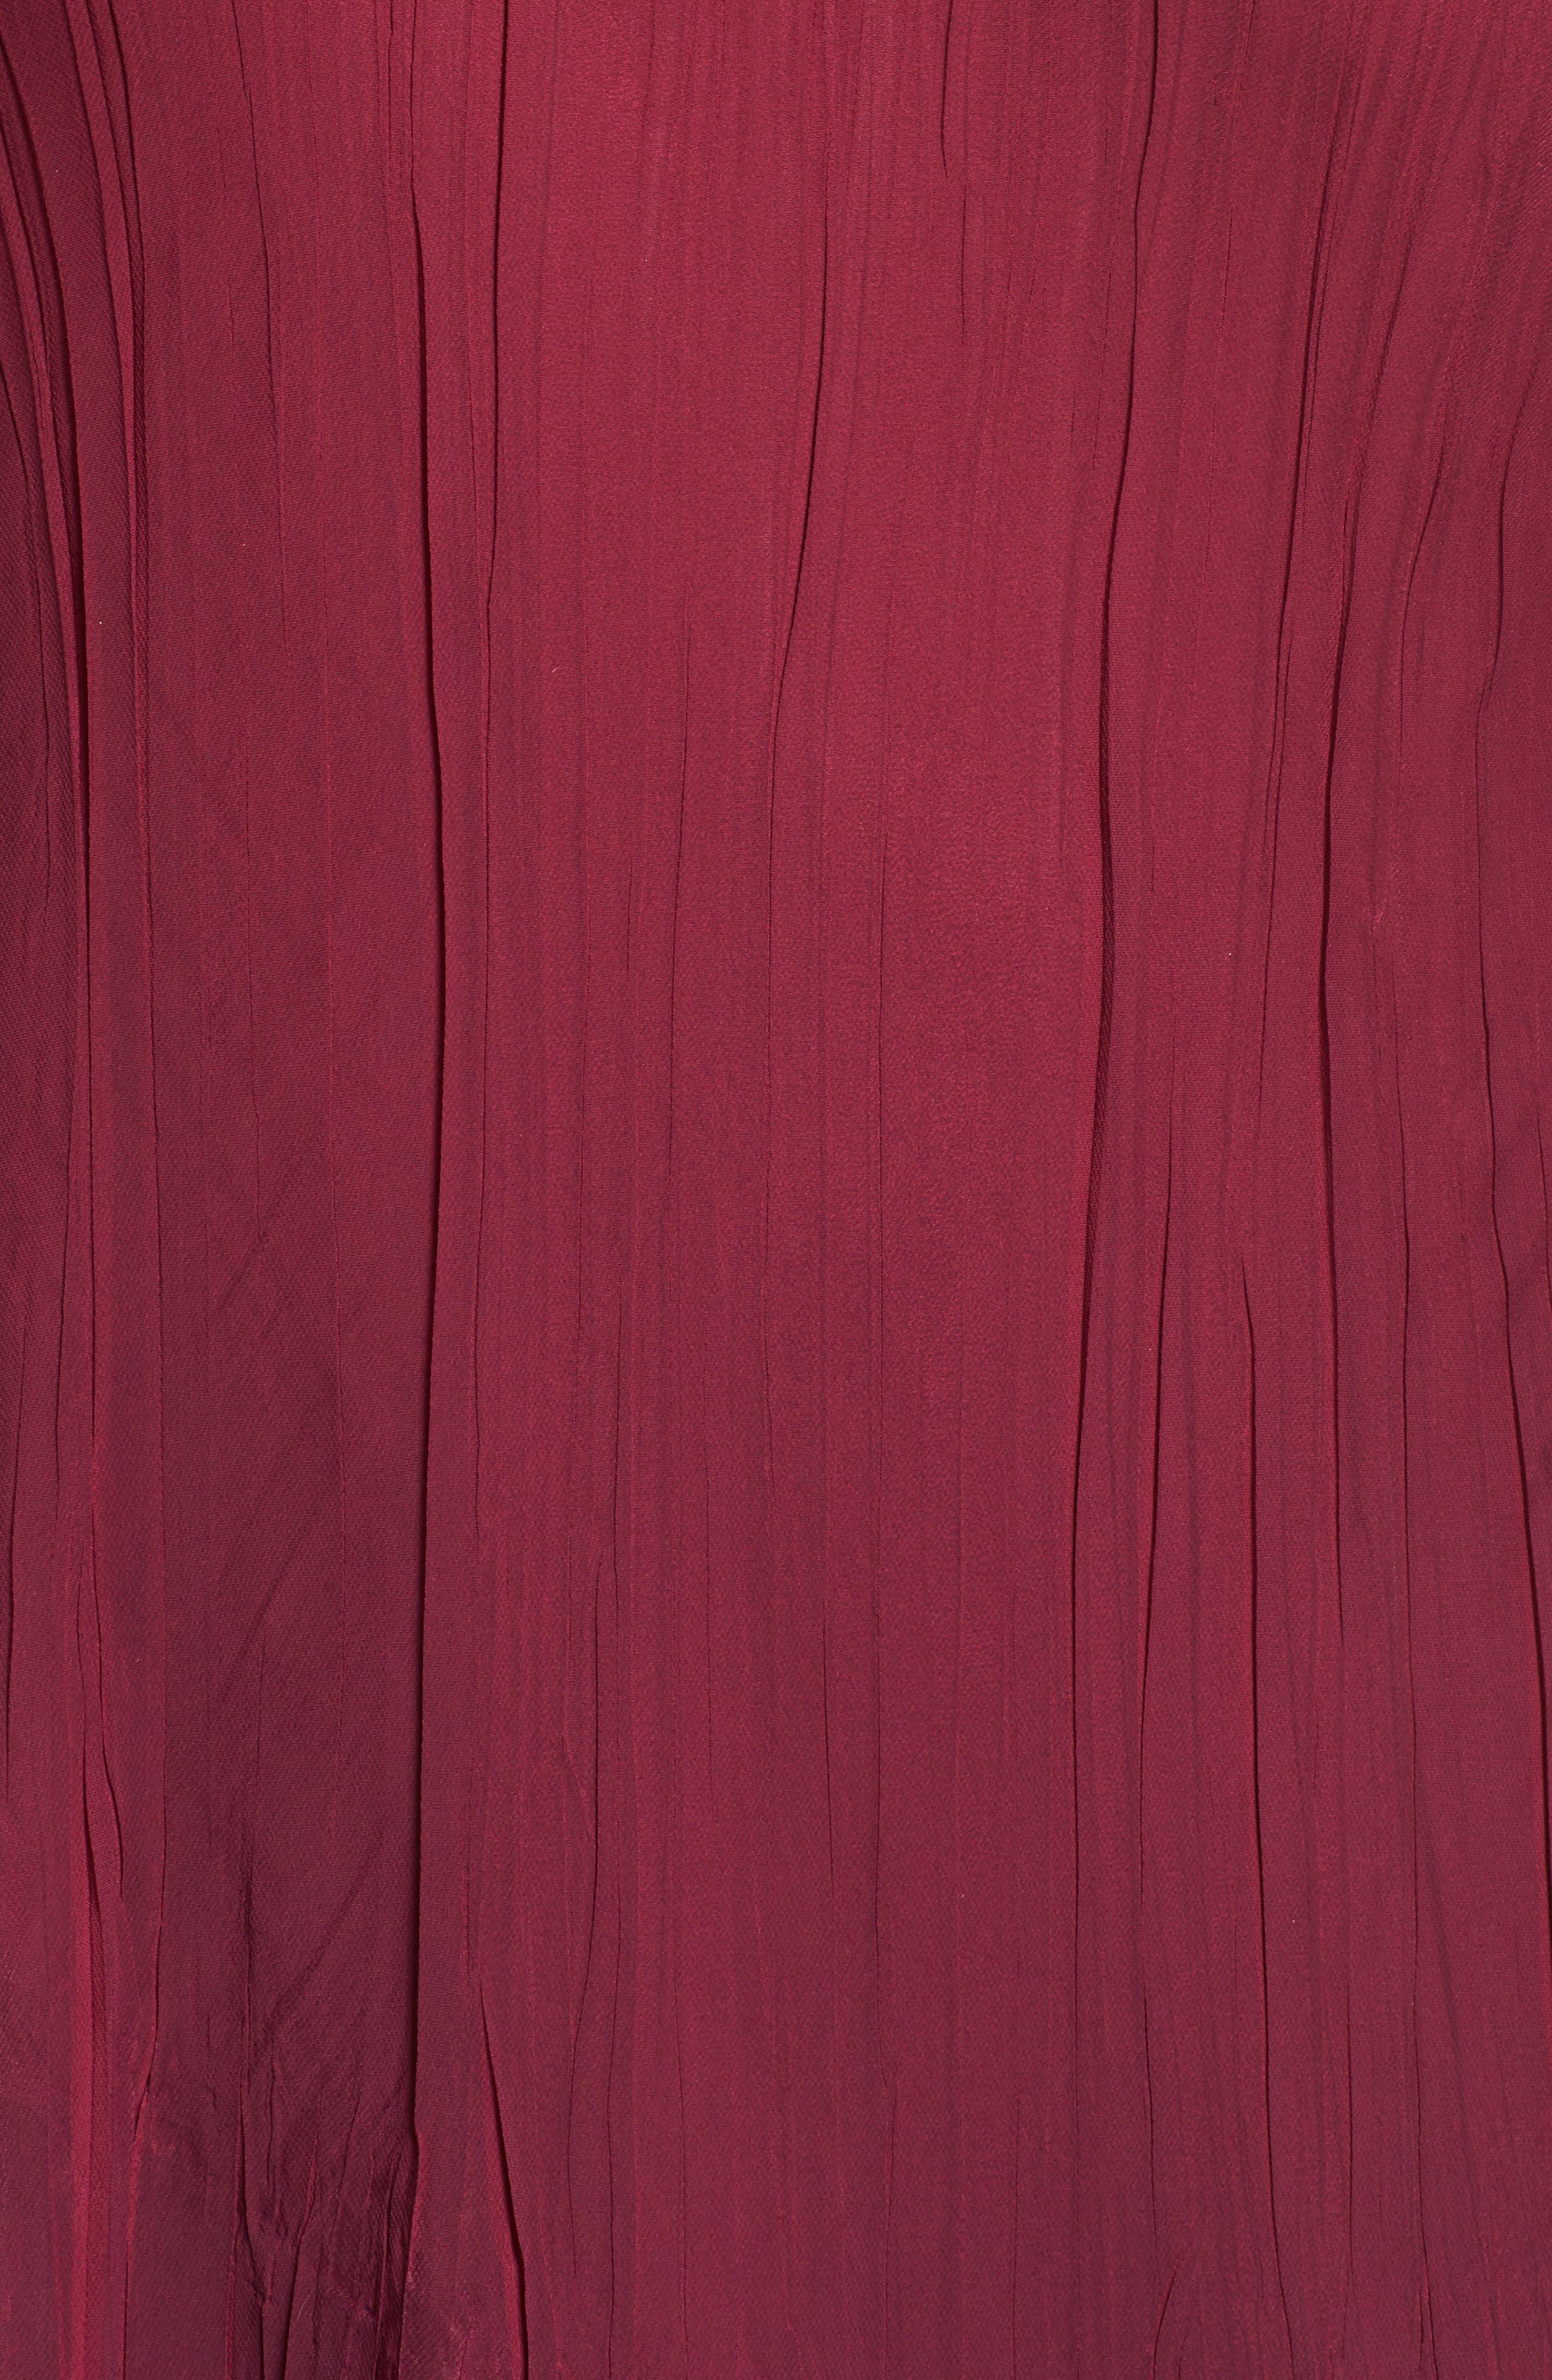 Tiered Ombrè Charmeuse & Chiffon Dress,                             Alternate thumbnail 5, color,